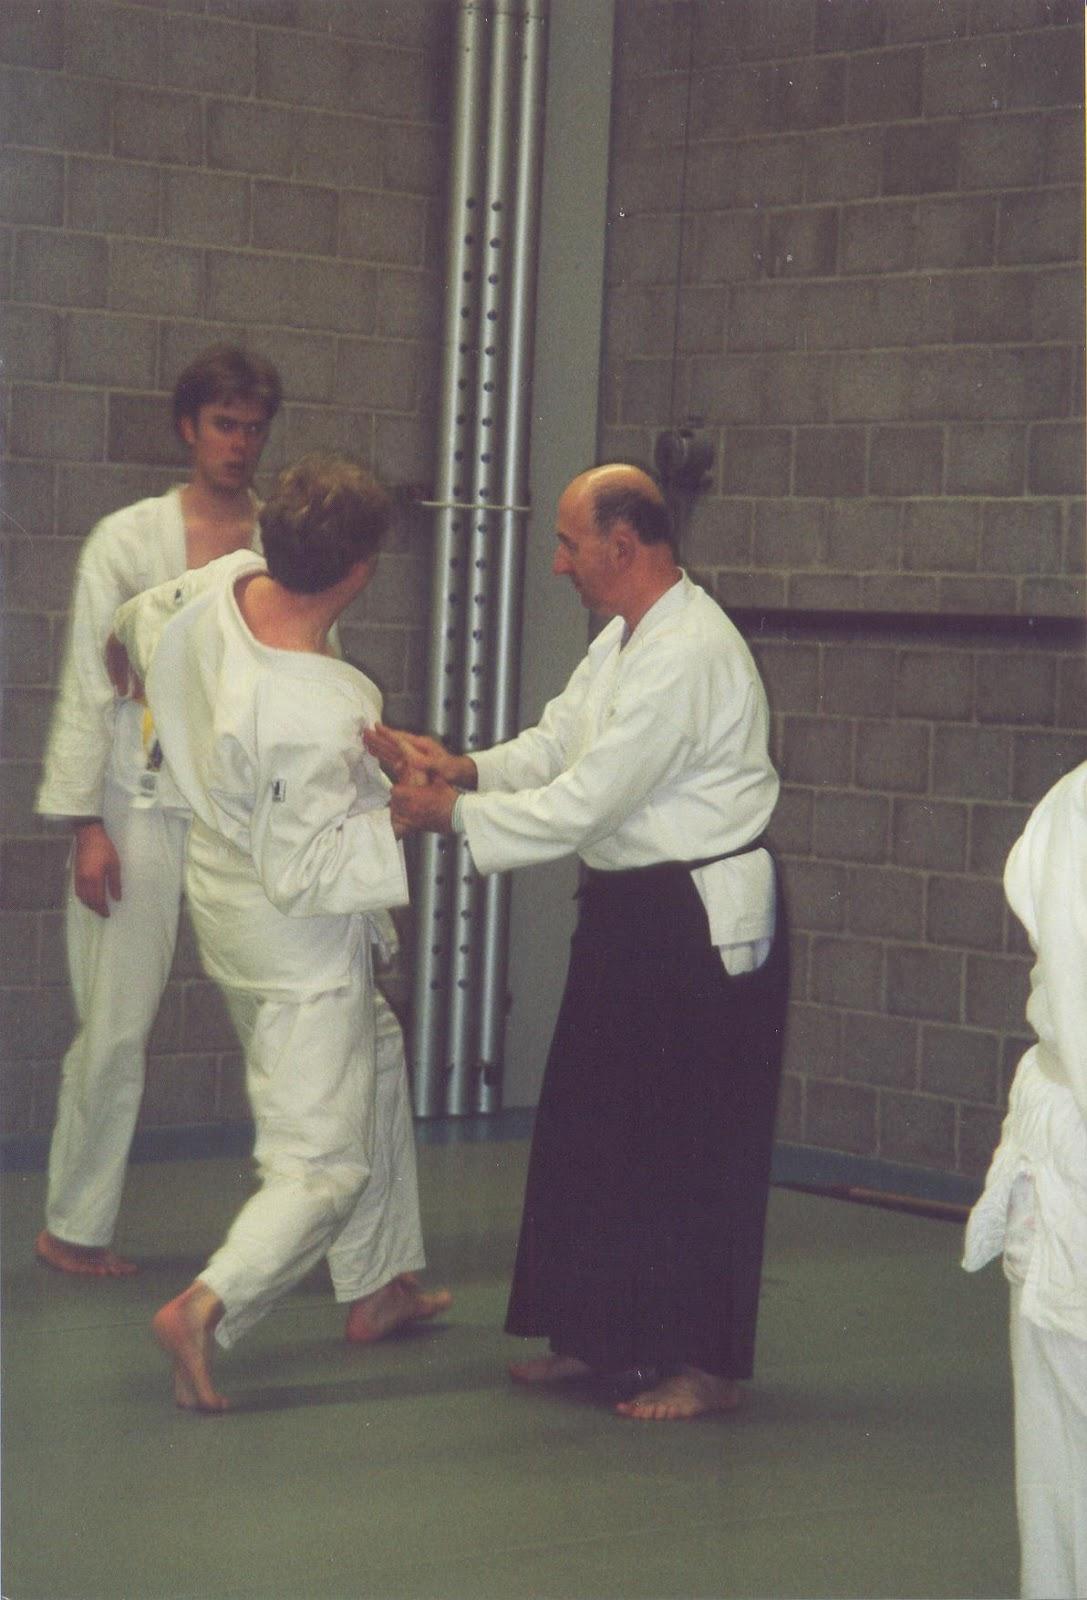 Alan ruddock demonstreert kote gaeshi tijdens seminar in leiden